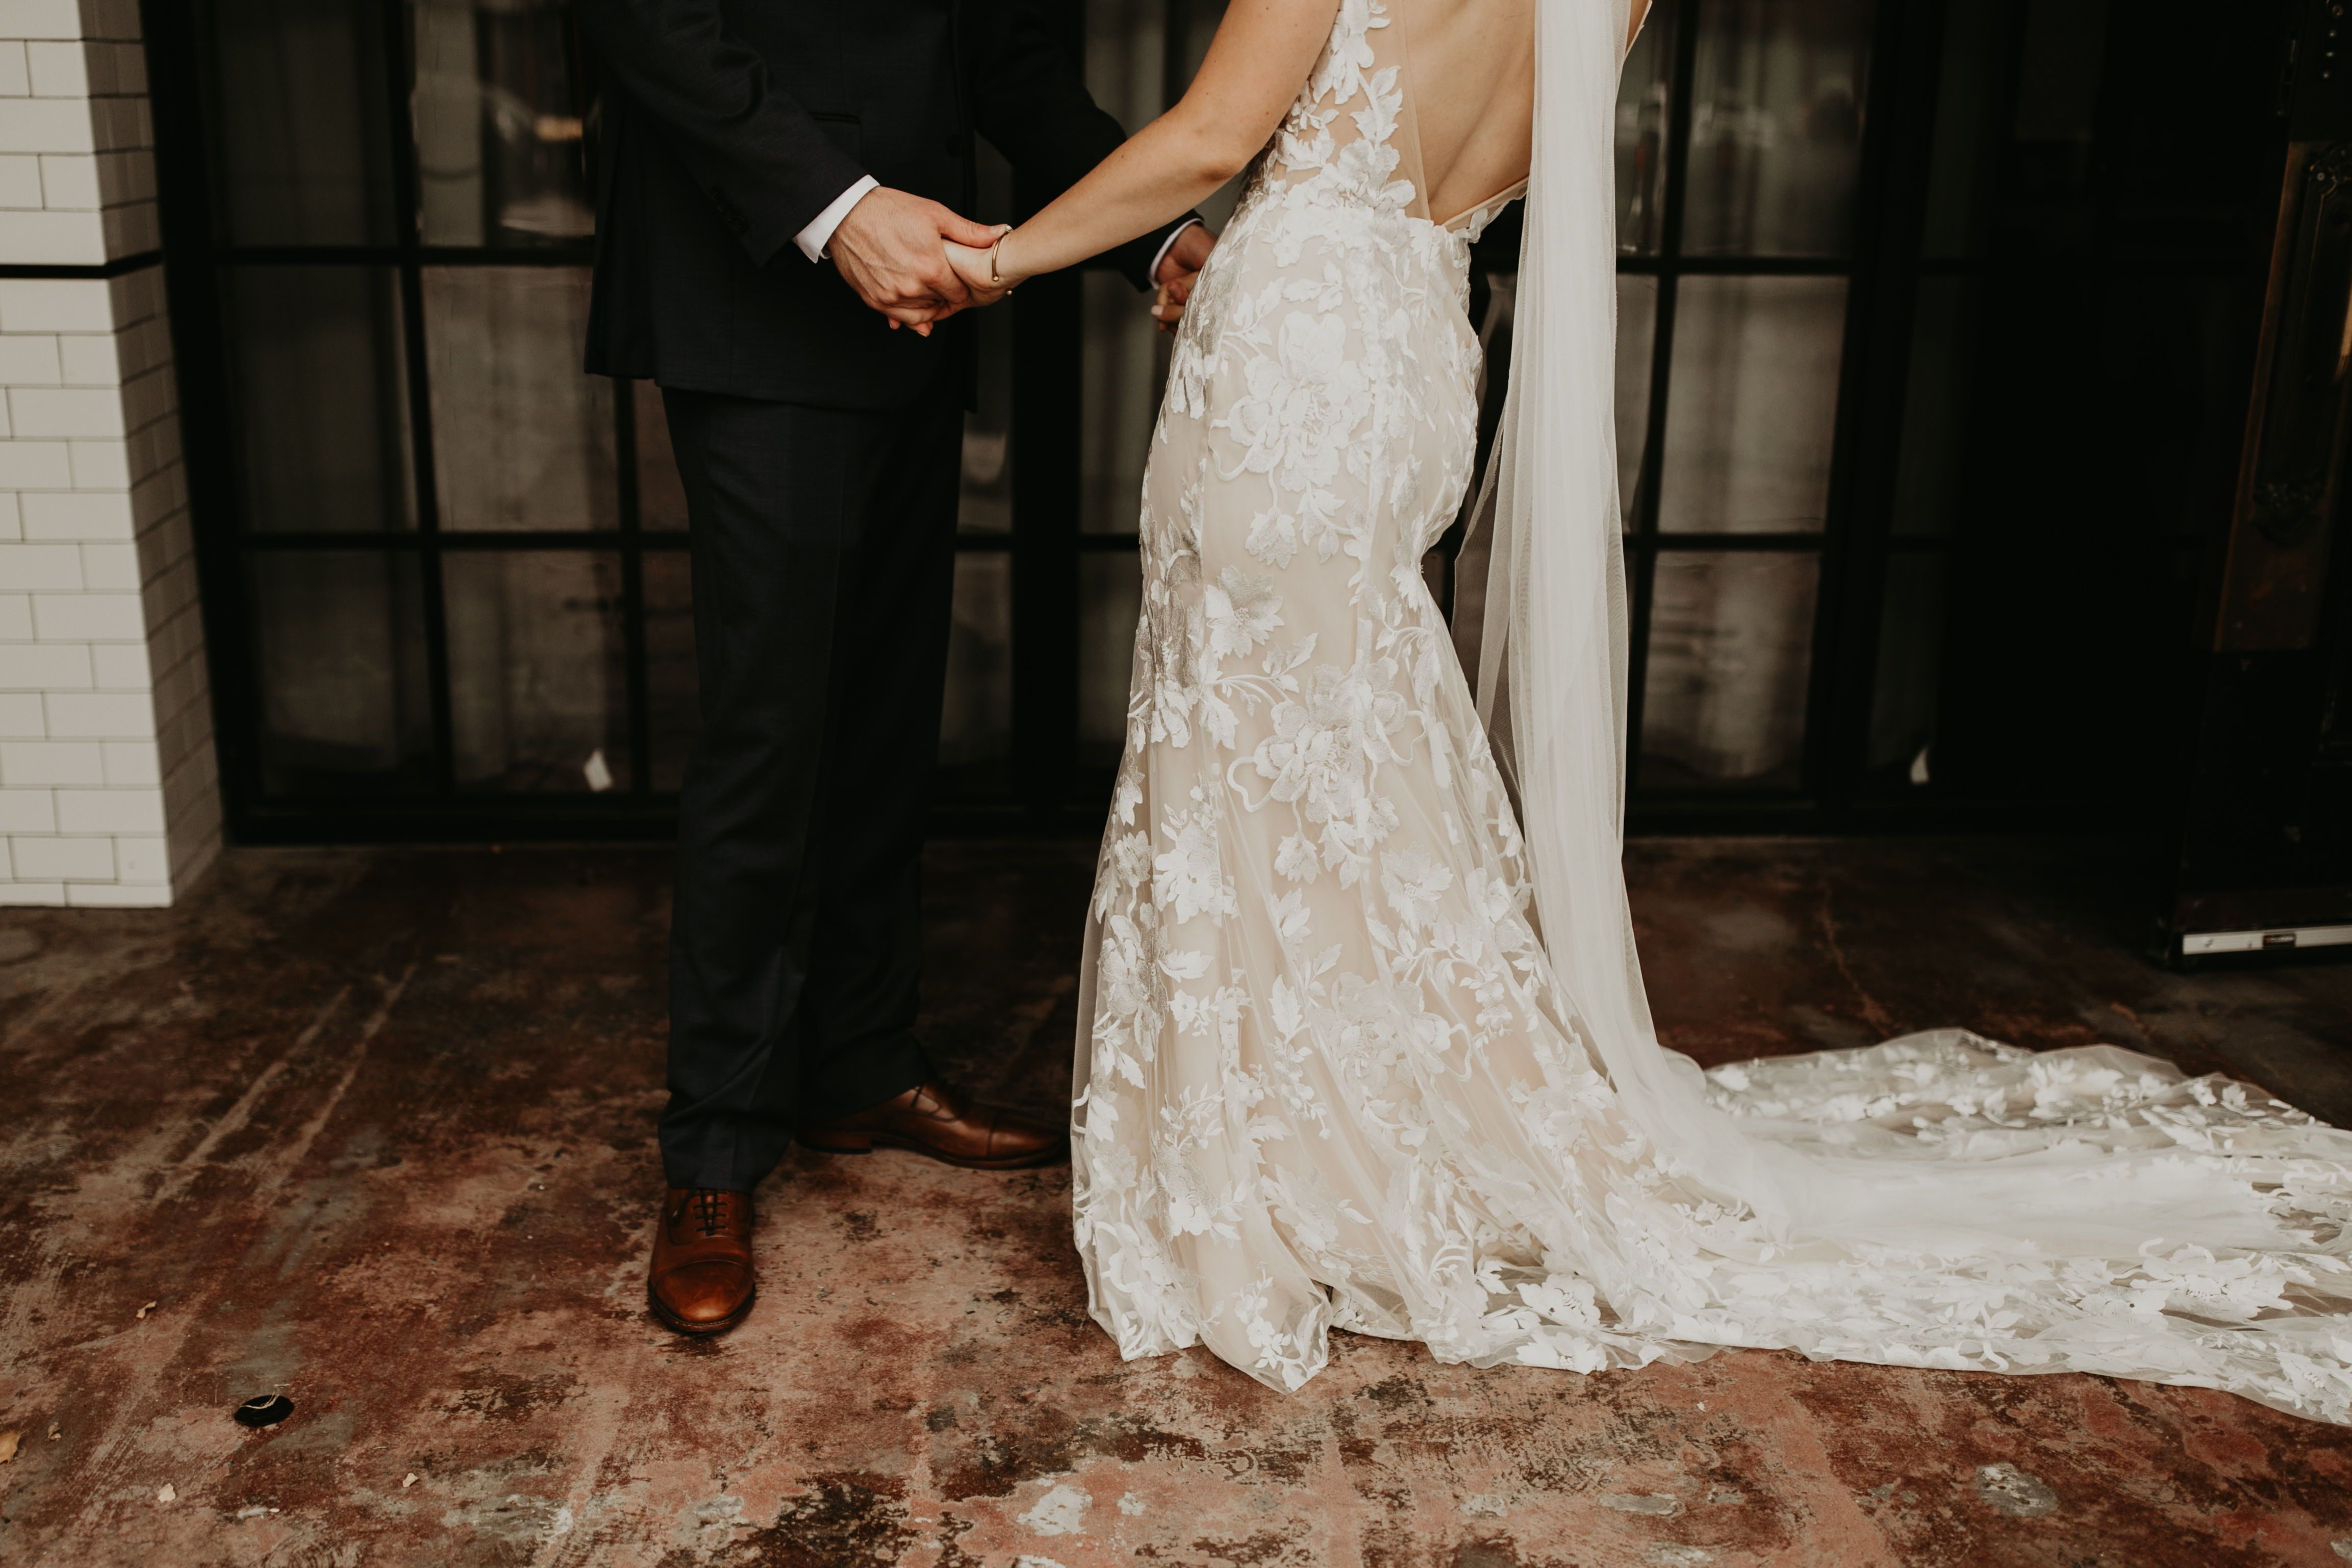 Wedding Photography Wedding Inspiration Made With Love Bridal Made With Love Gown Bridal Gown Wed Off White Wedding Dresses Kansas City Wedding Kc Wedding